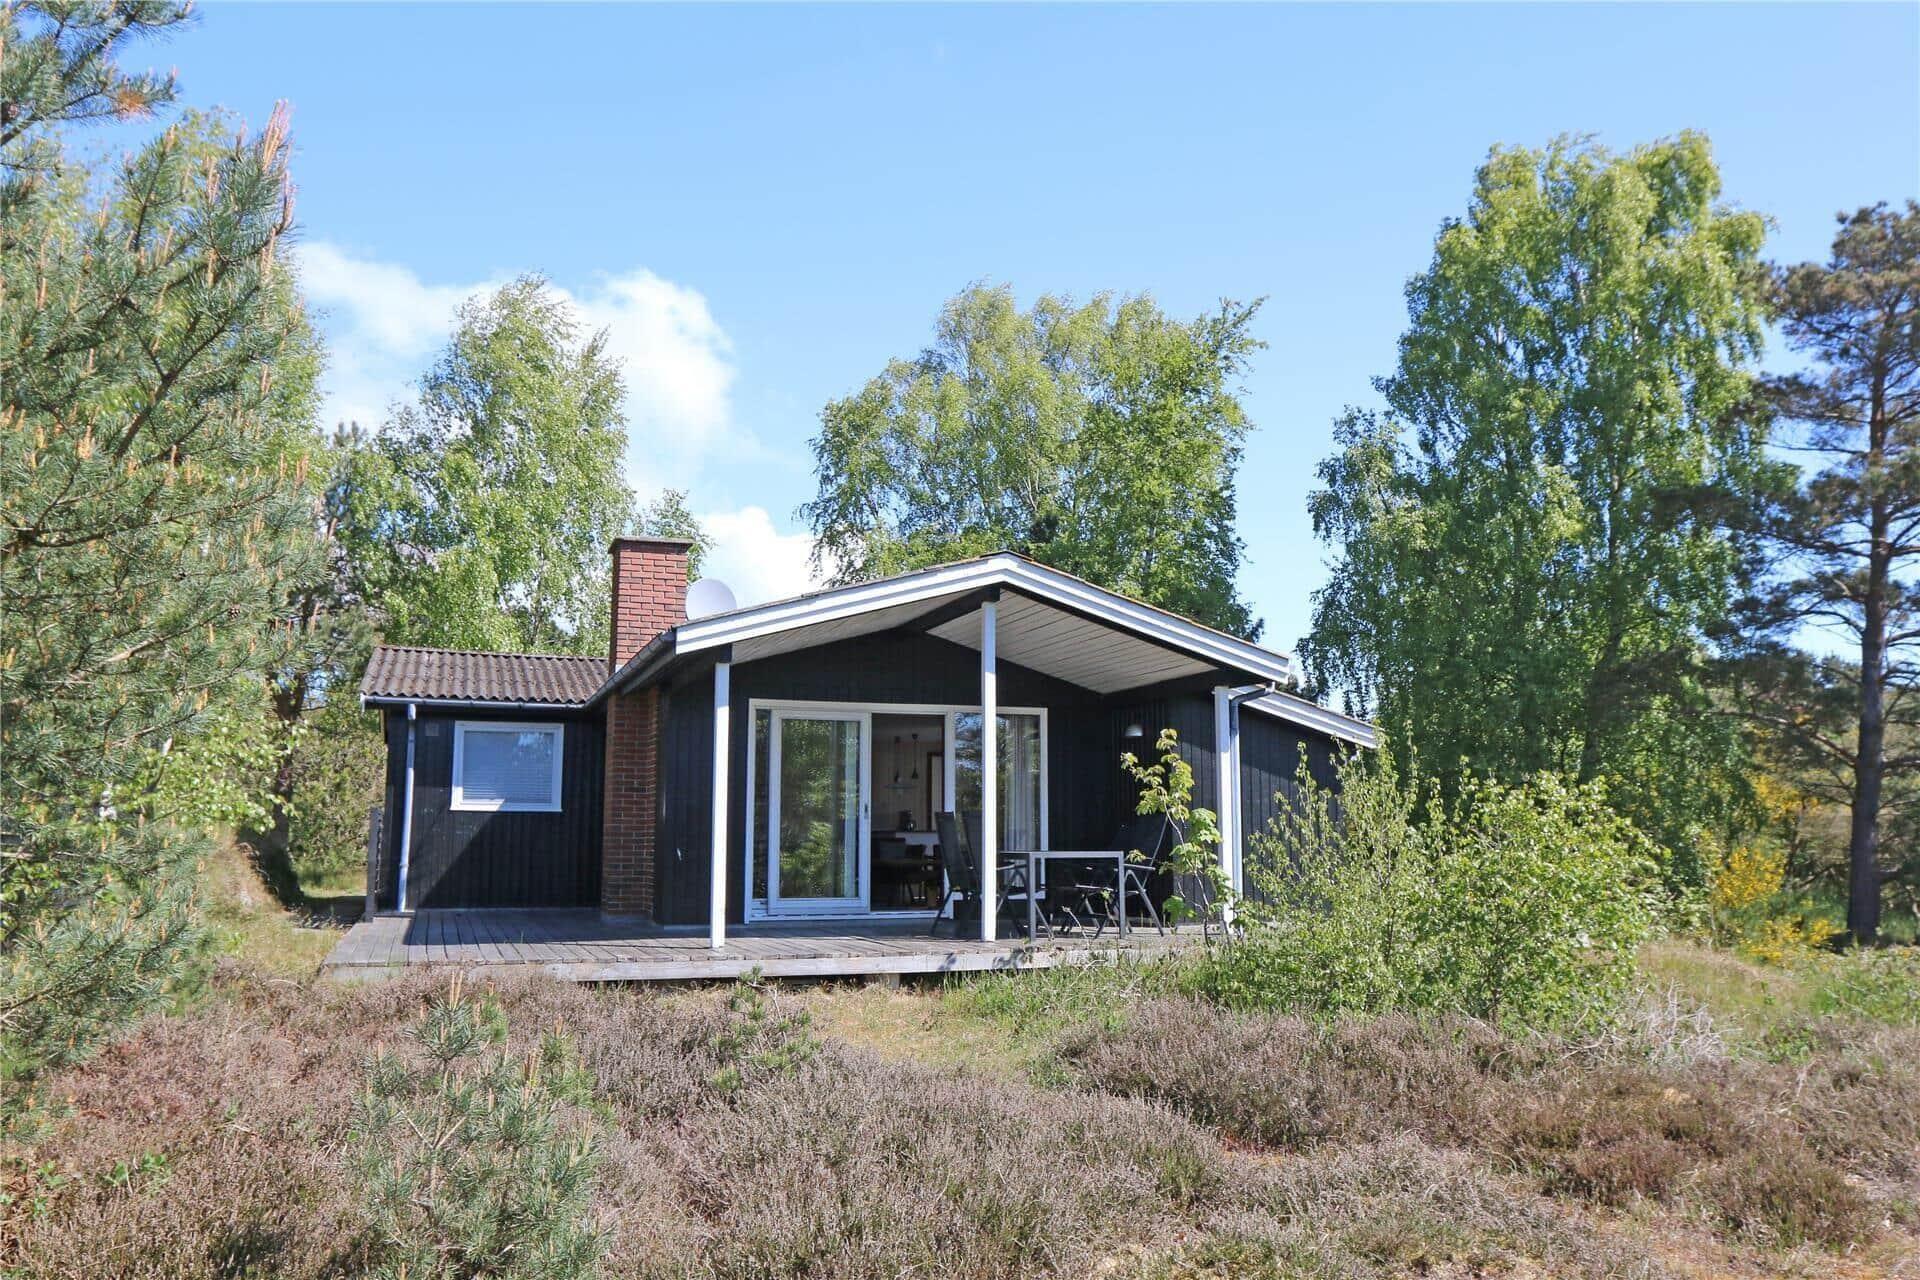 Billede 1-10 Sommerhus 1536, Søhøjbakken 18, DK - 3720 Aakirkeby